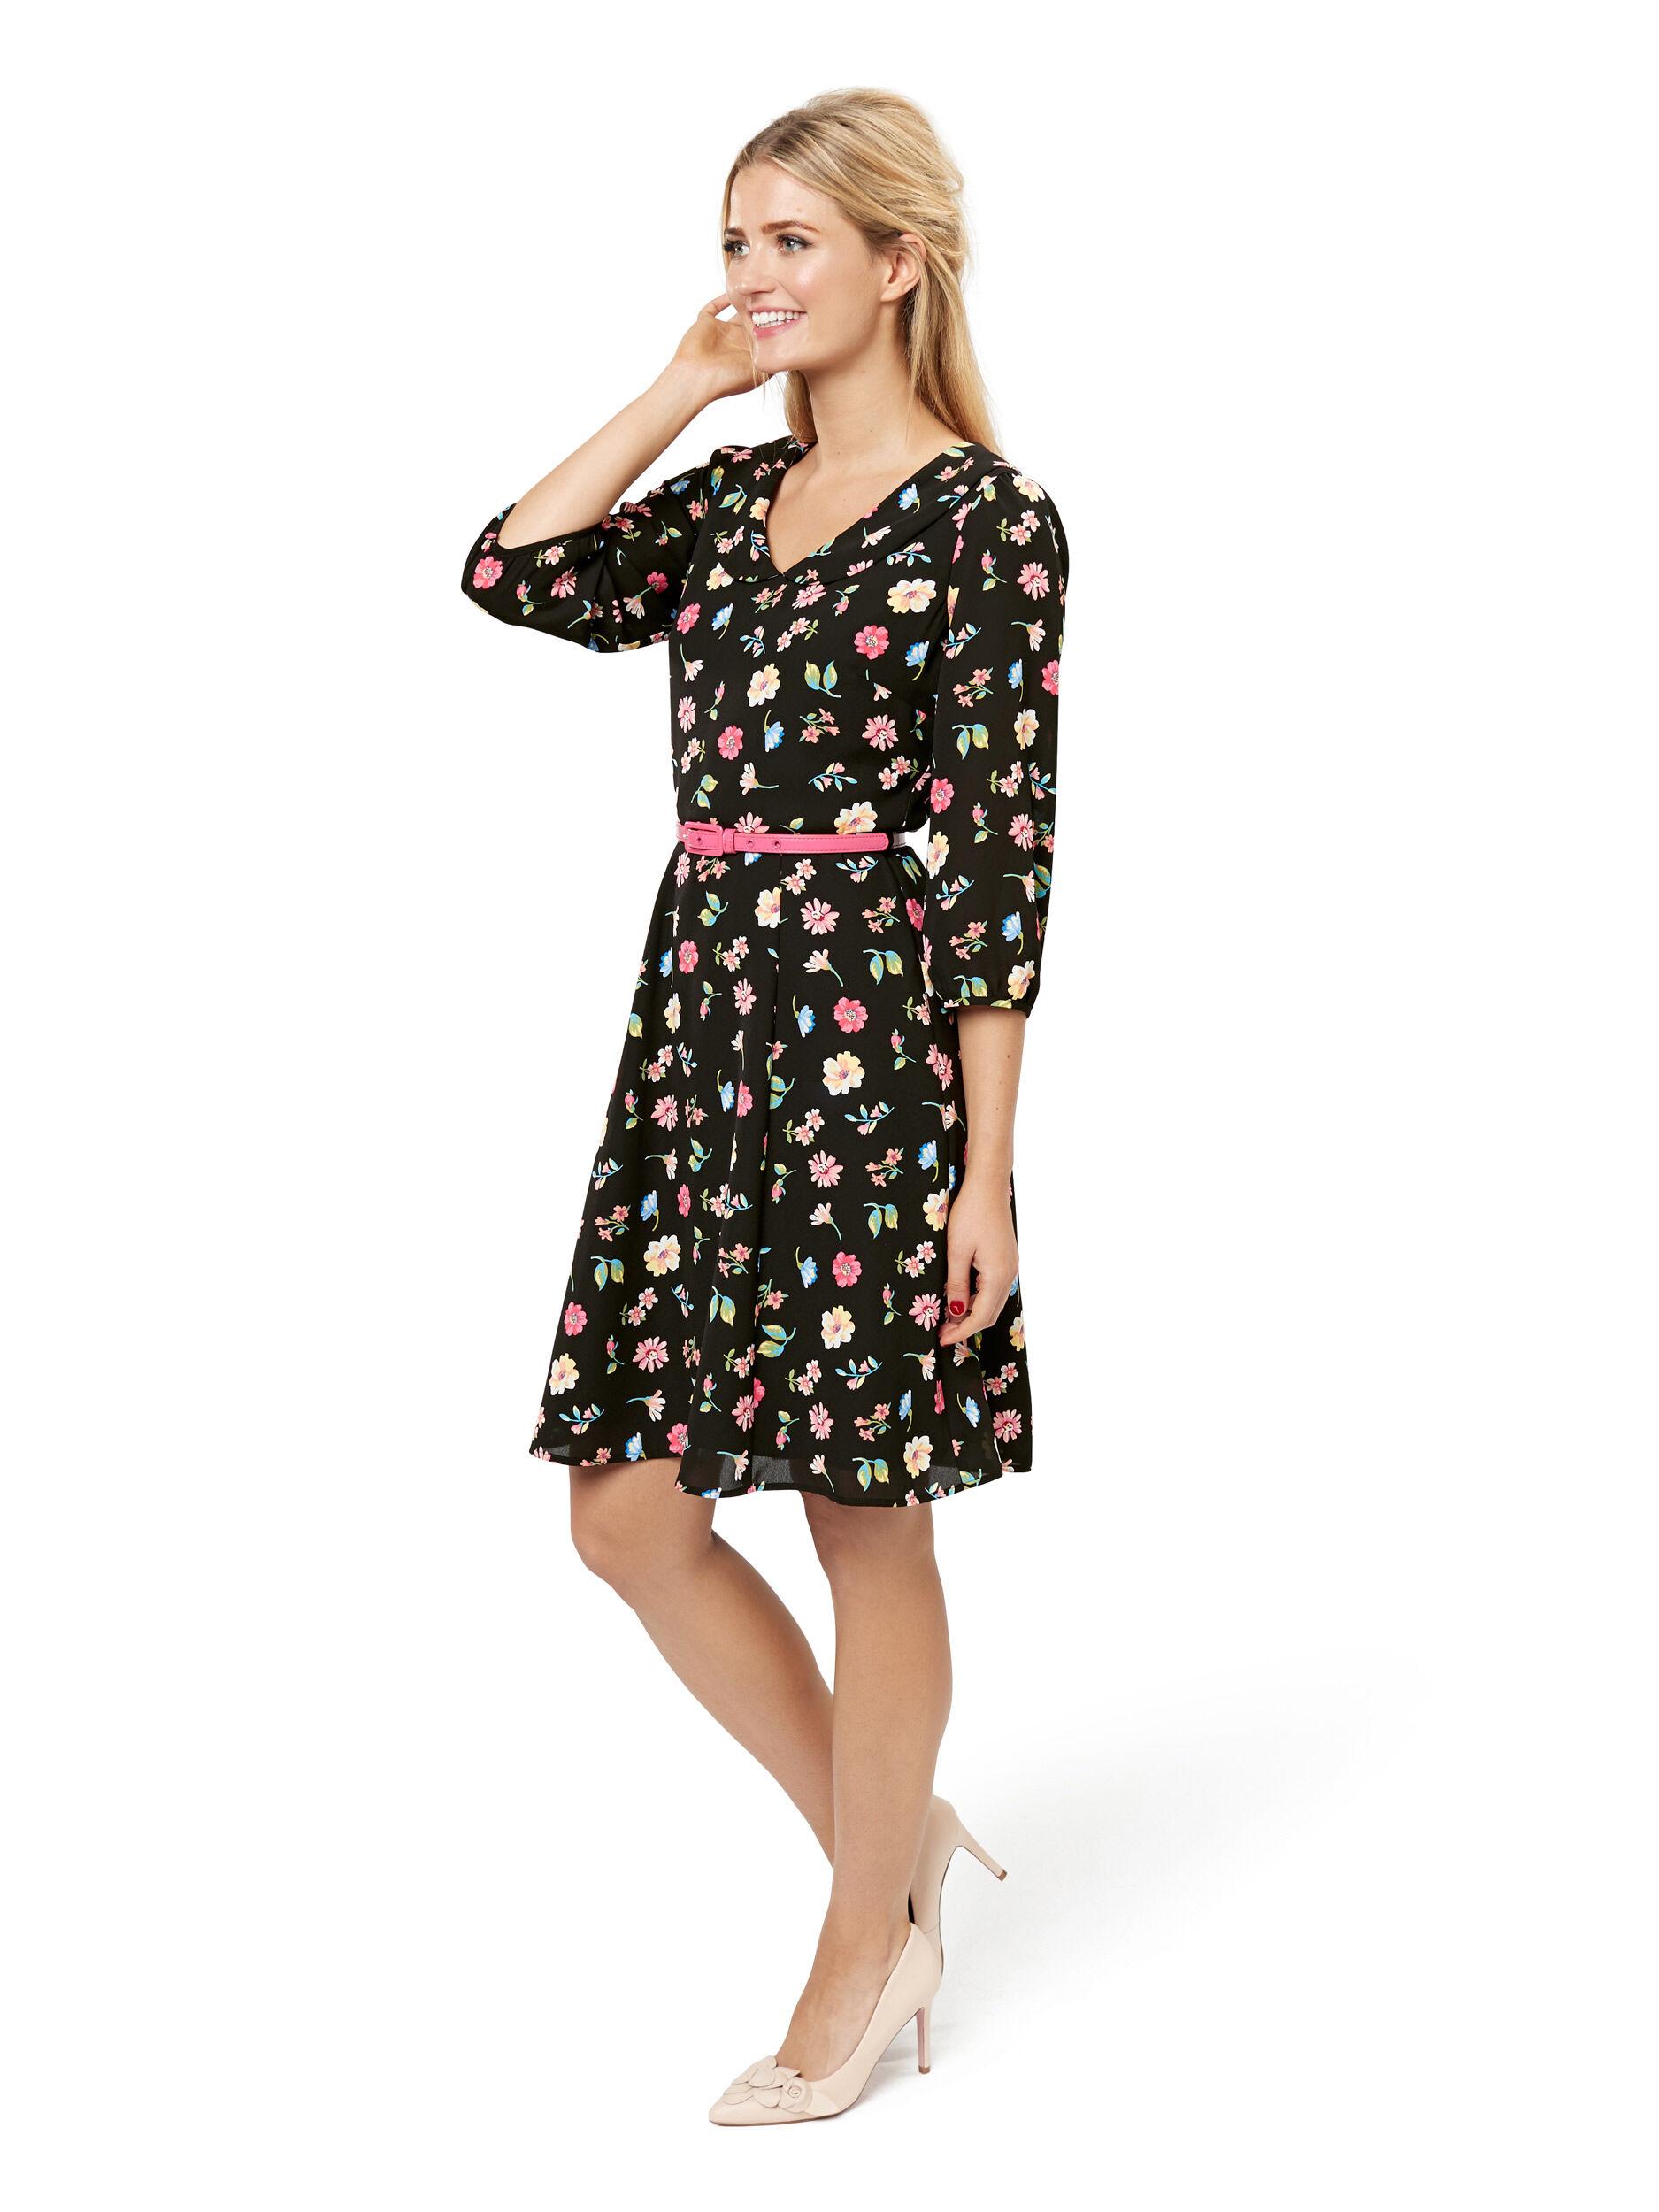 Floral Rush Dress